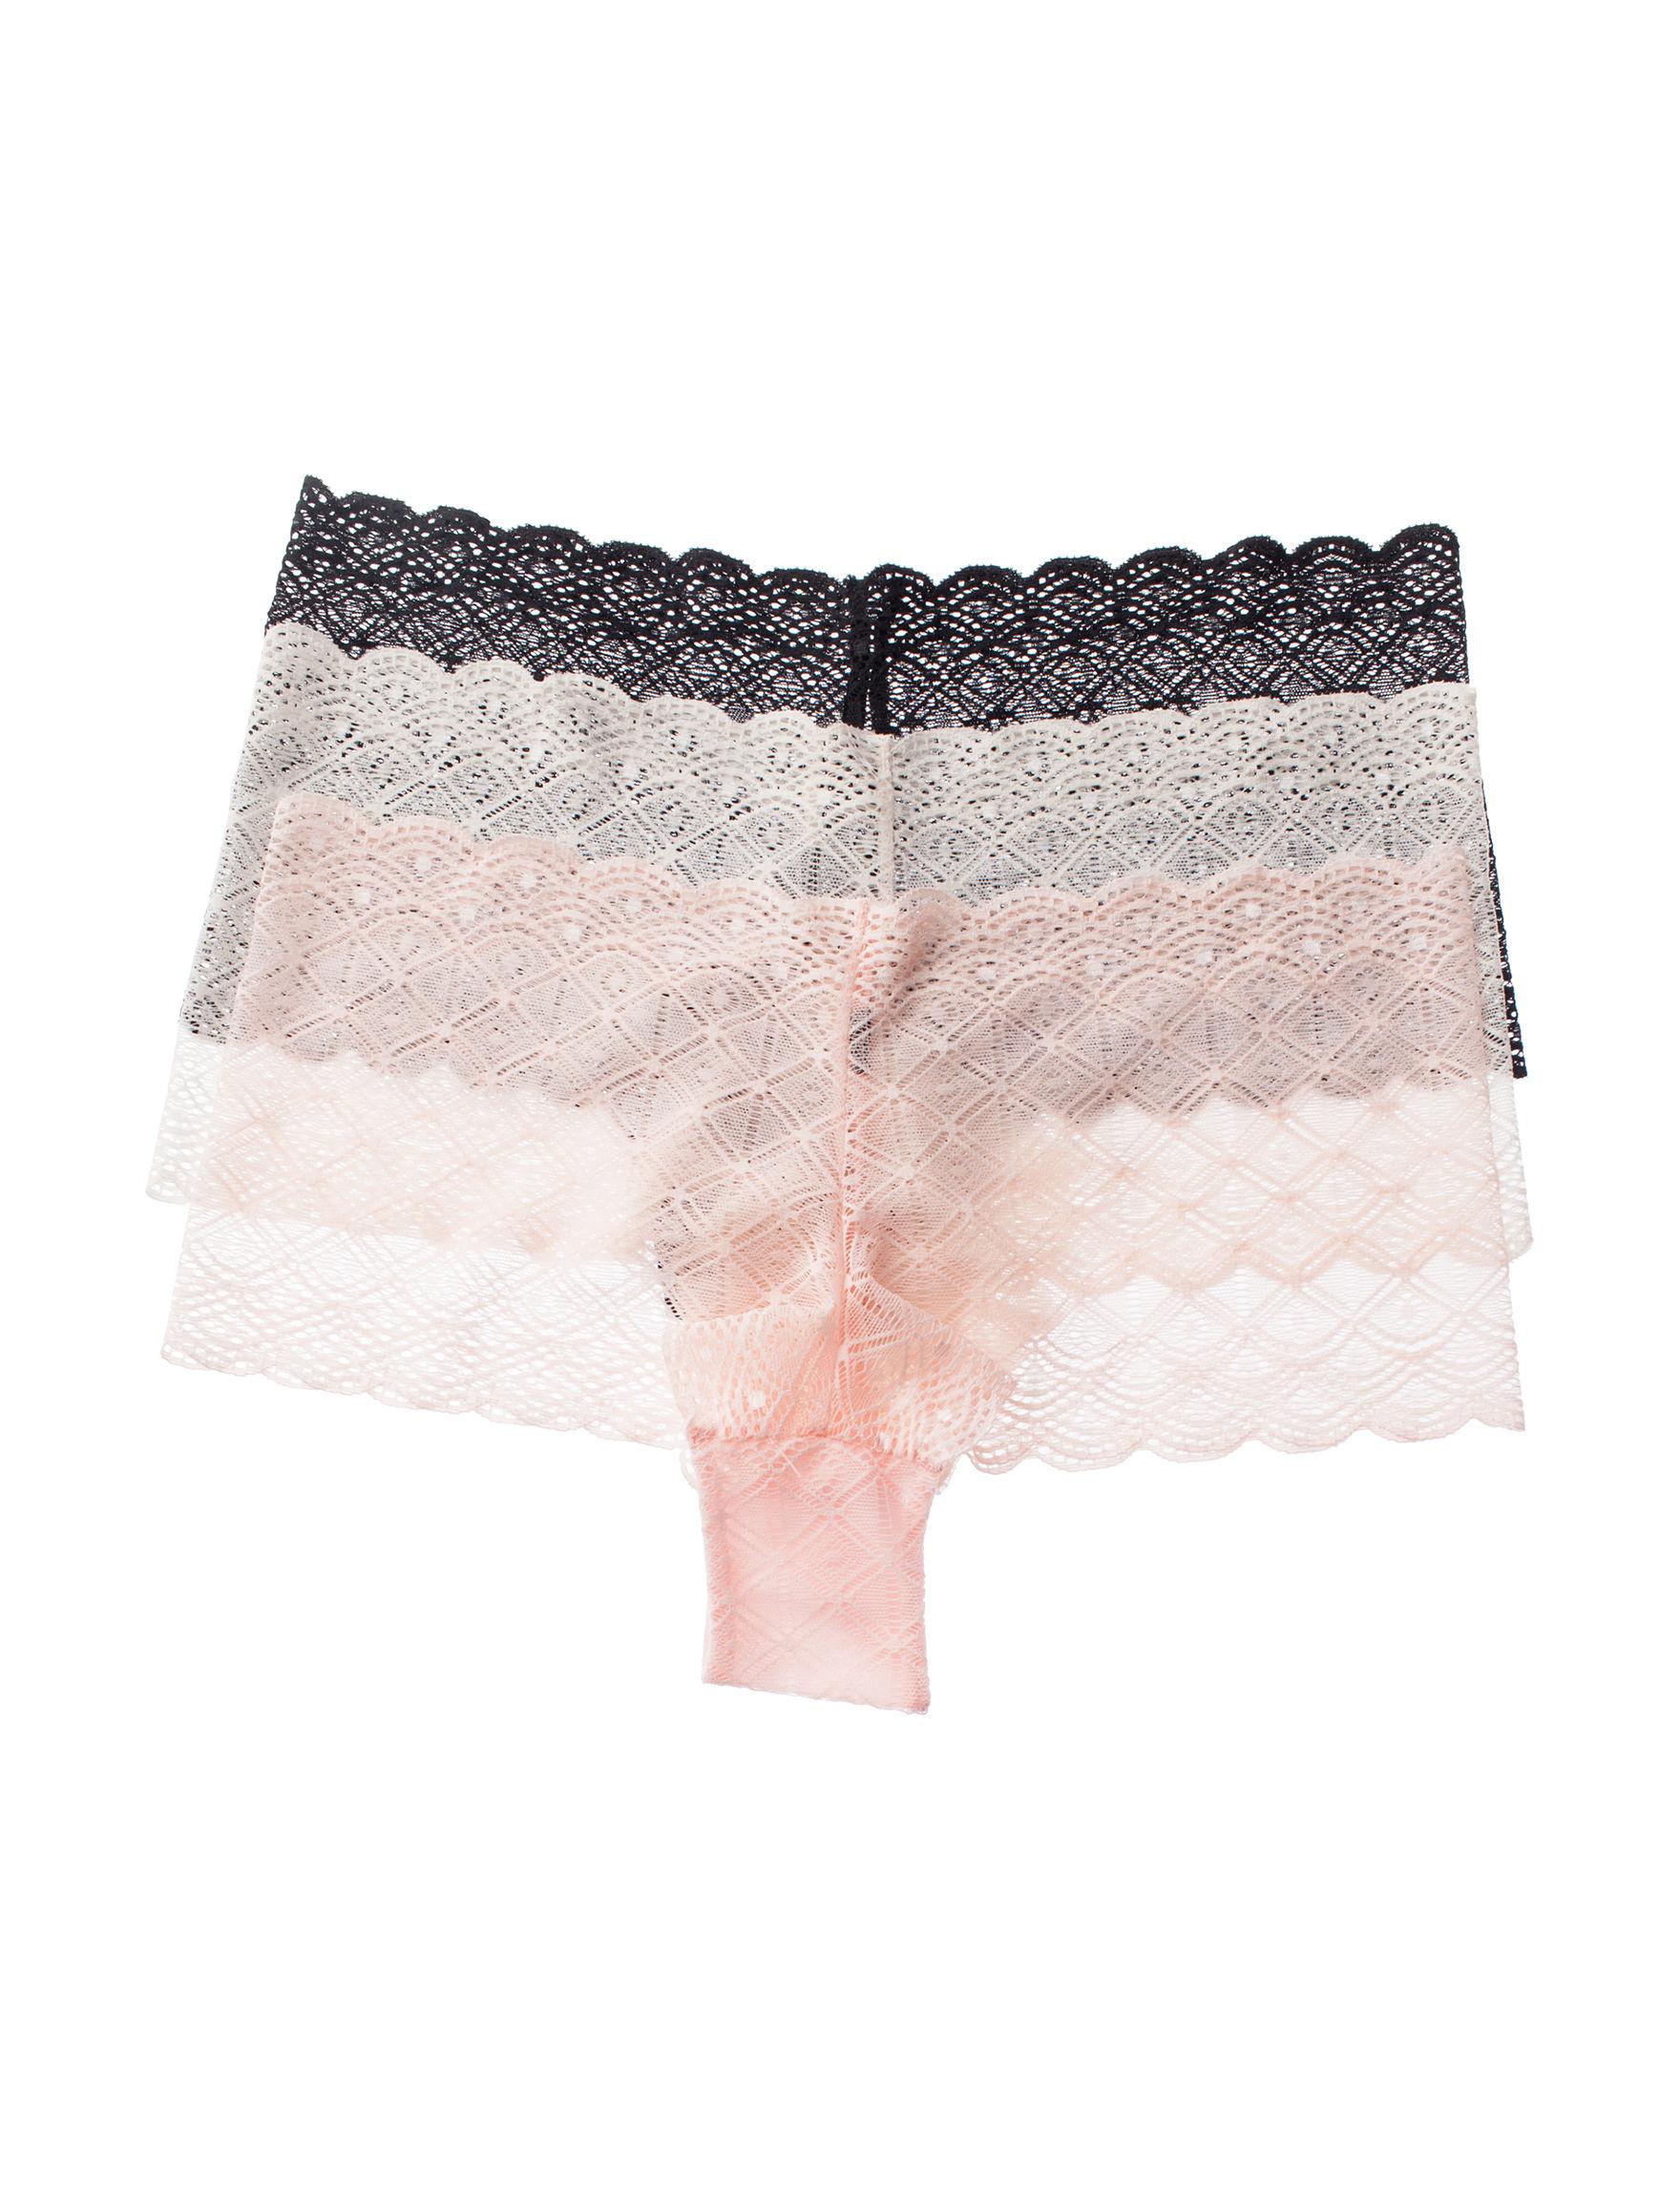 Rene Rofe Multi Panties